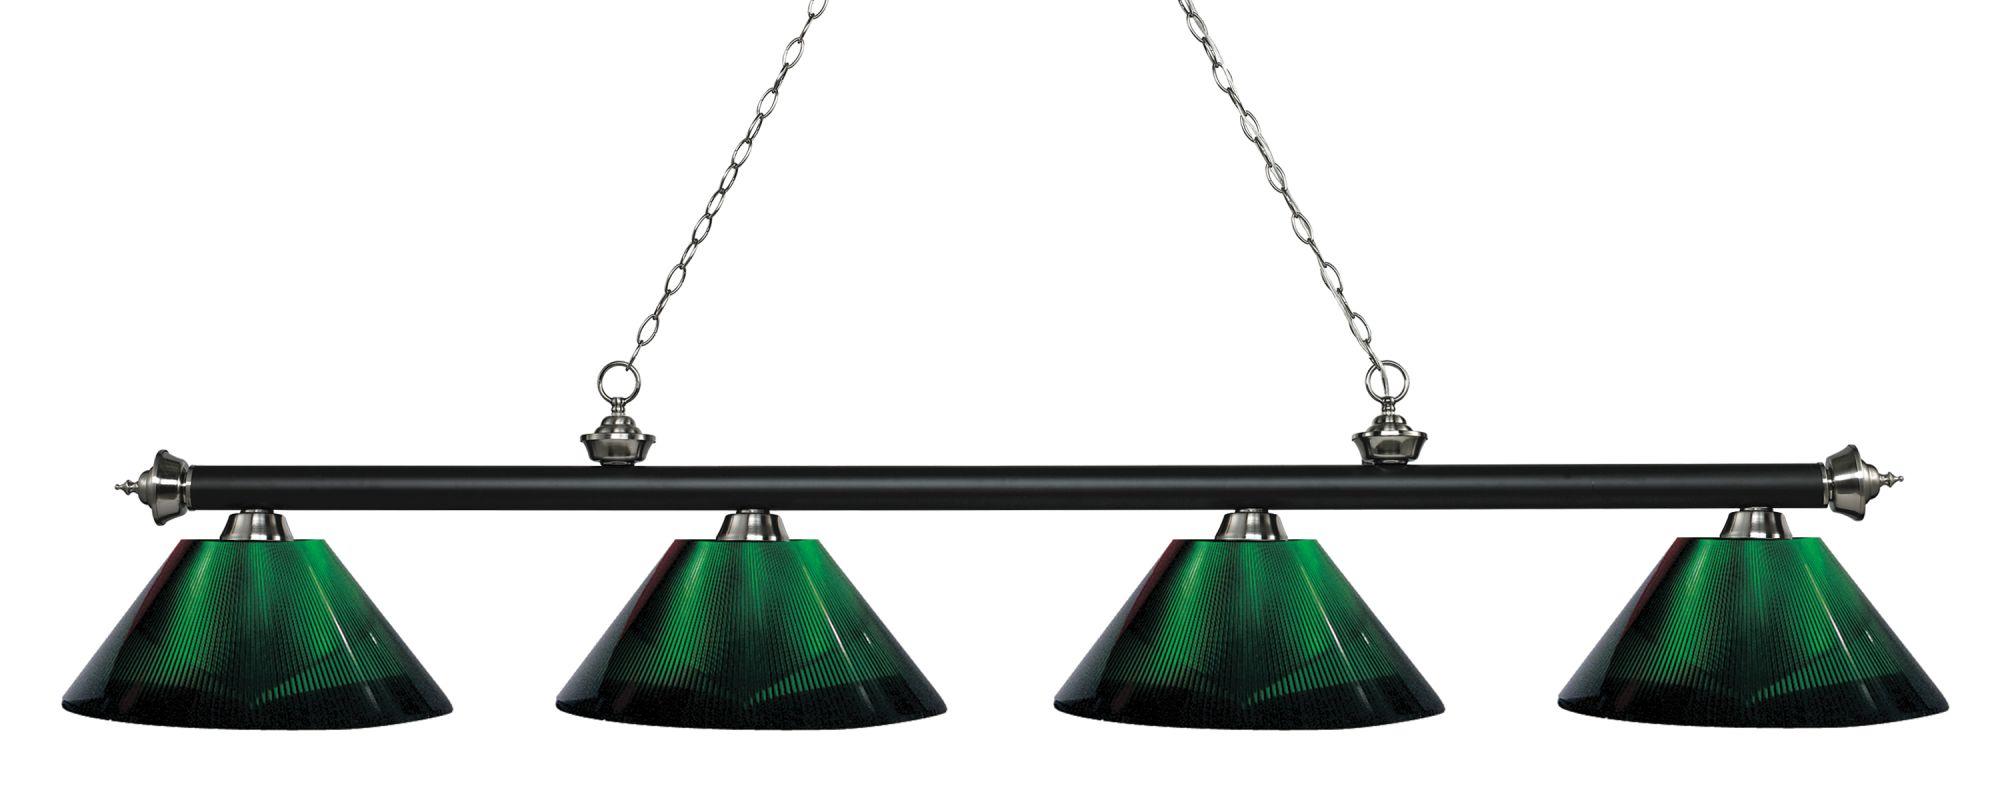 Z-Lite 200-4-ARG Riviera 4 Light Island/Billiard Light with Green Sale $366.00 ITEM: bci2758335 ID#:200-4MB+BN-ARG UPC: 685659060386 :